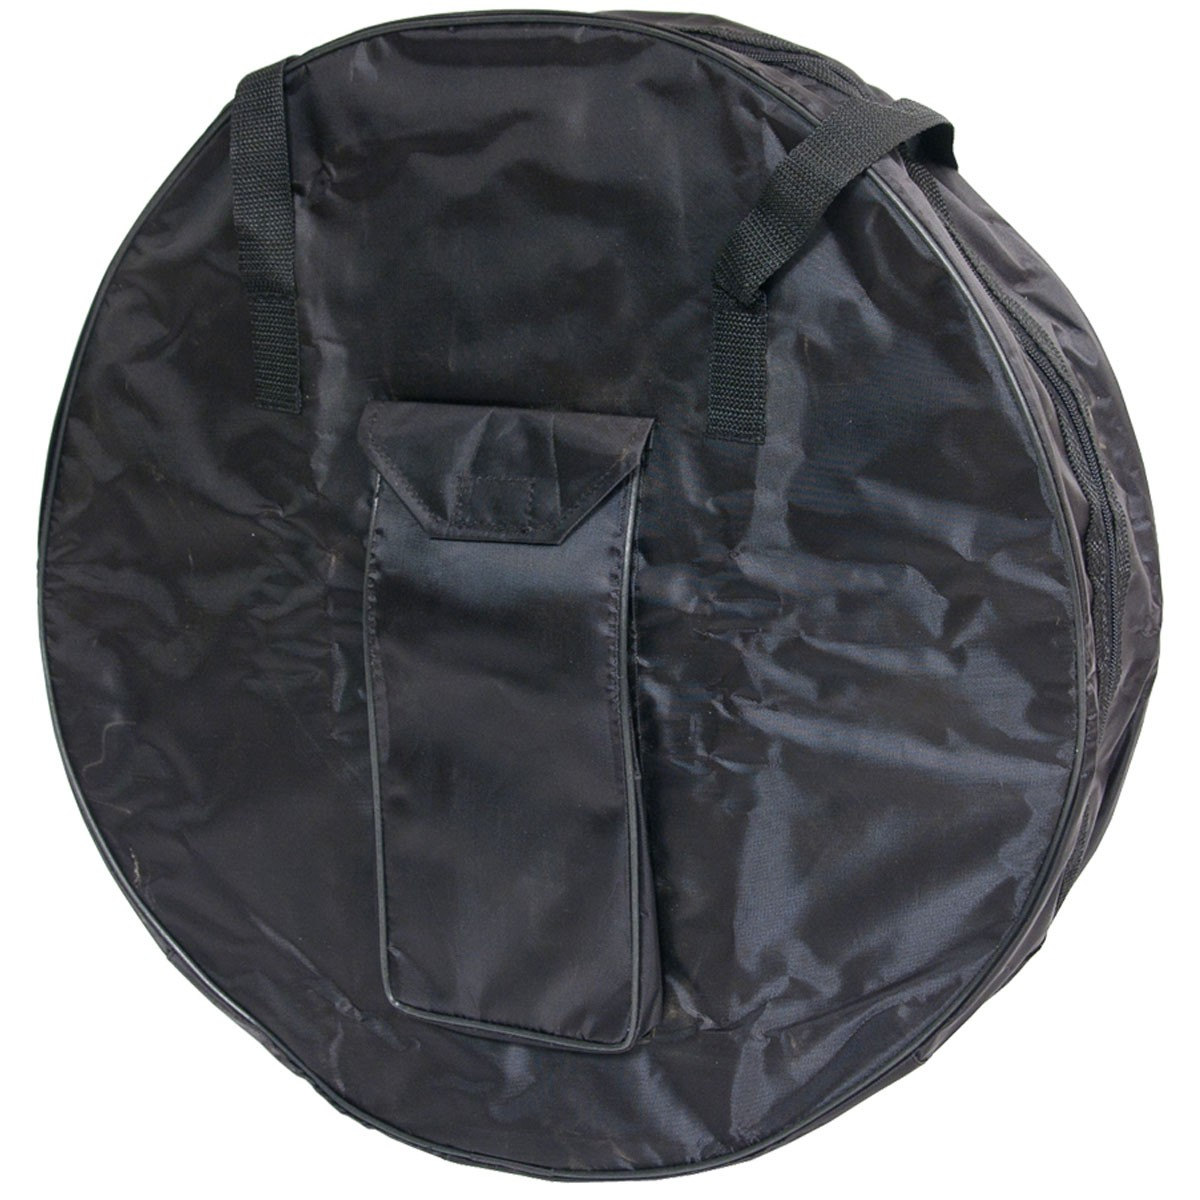 Roosebeck Economy Gig Bag for Bodhran 18' x 5'